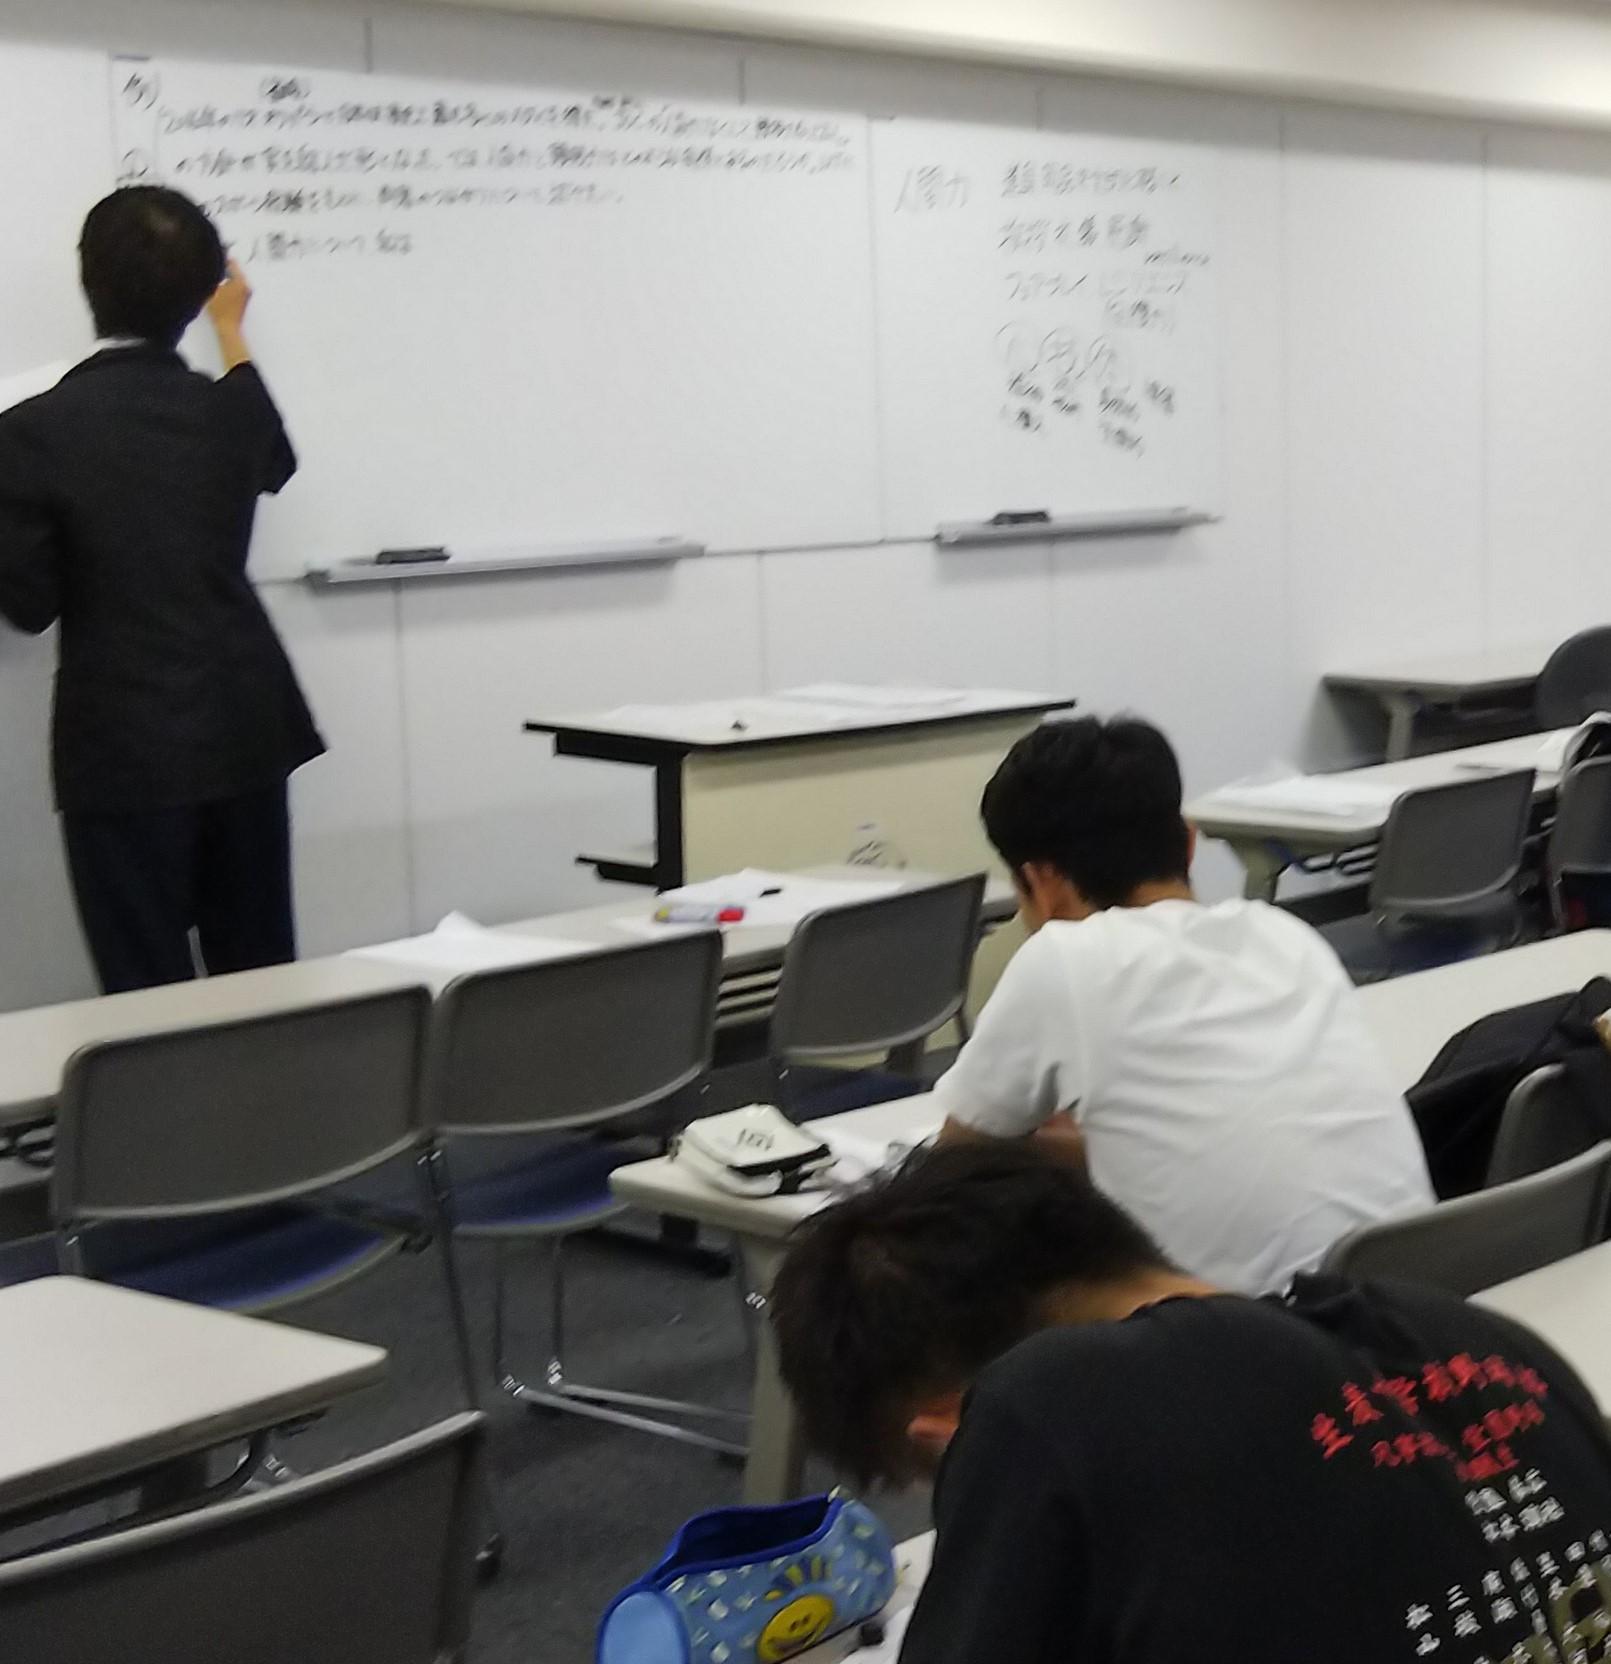 http://www.e-taishin.com/diary/img/201107-tasaki2%E6%8E%88%E6%A5%AD%E2%91%A1.jpg